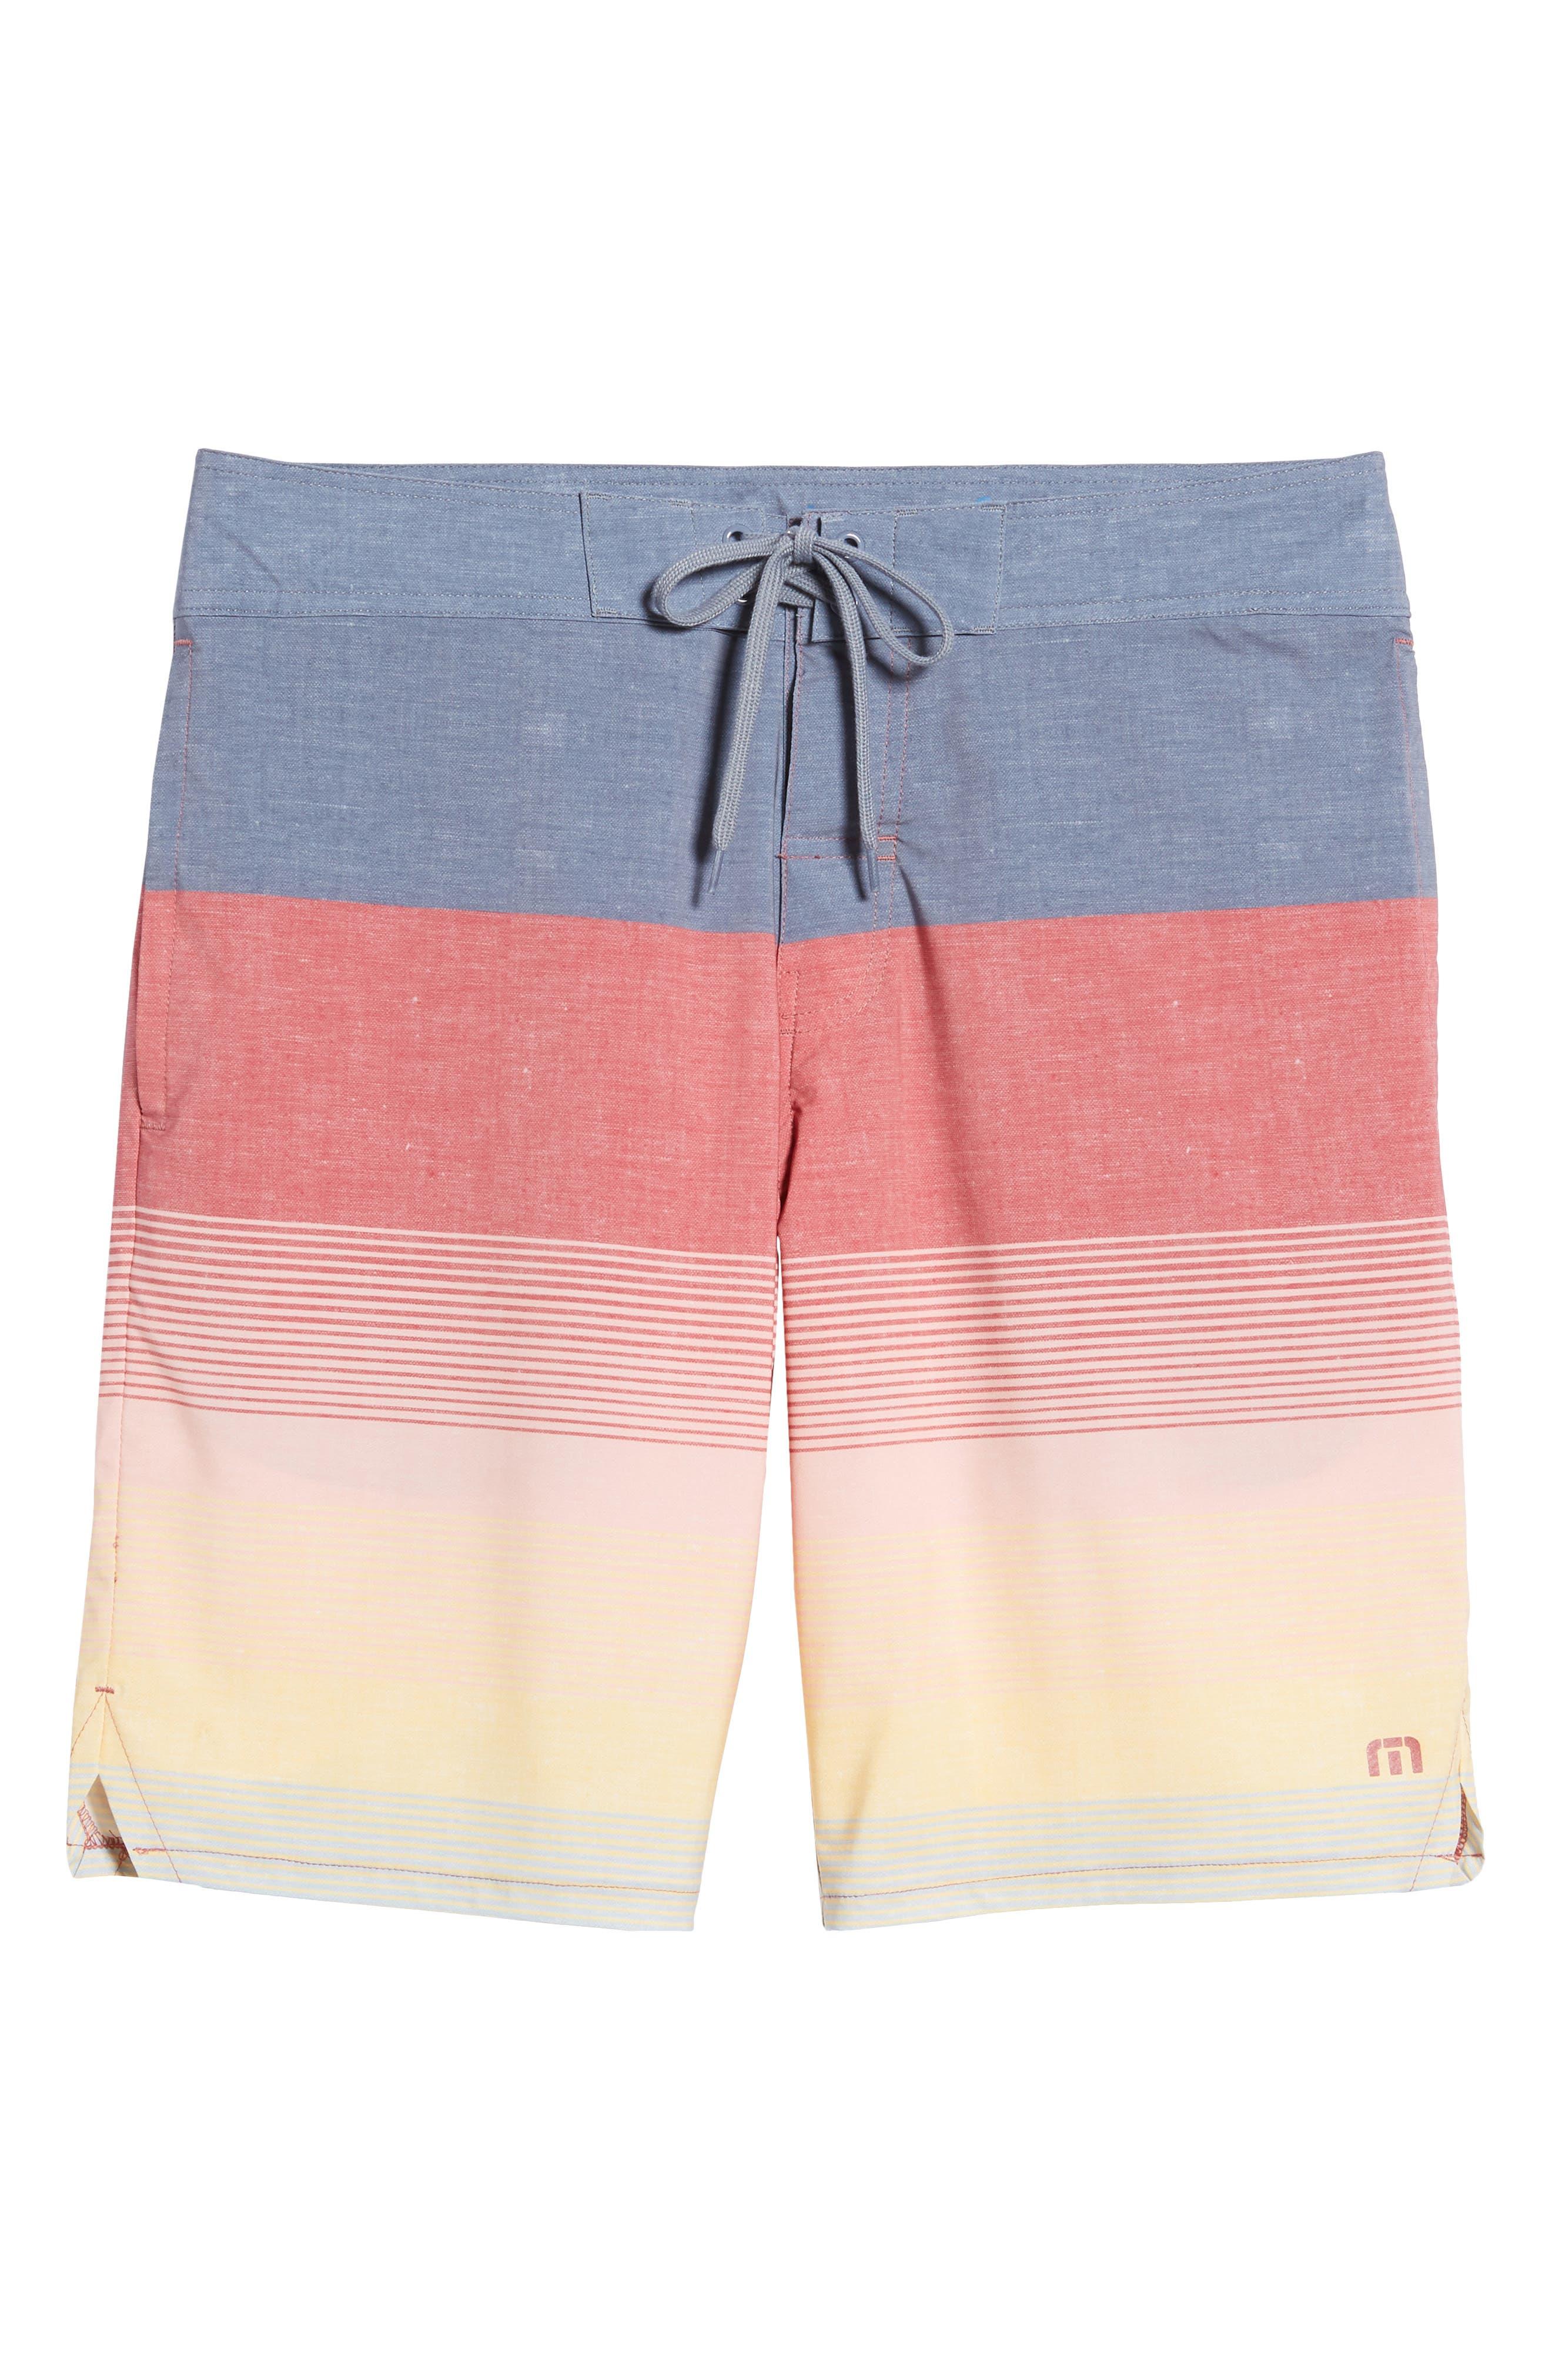 Seegrid Regular Fit Board Shorts,                             Alternate thumbnail 12, color,